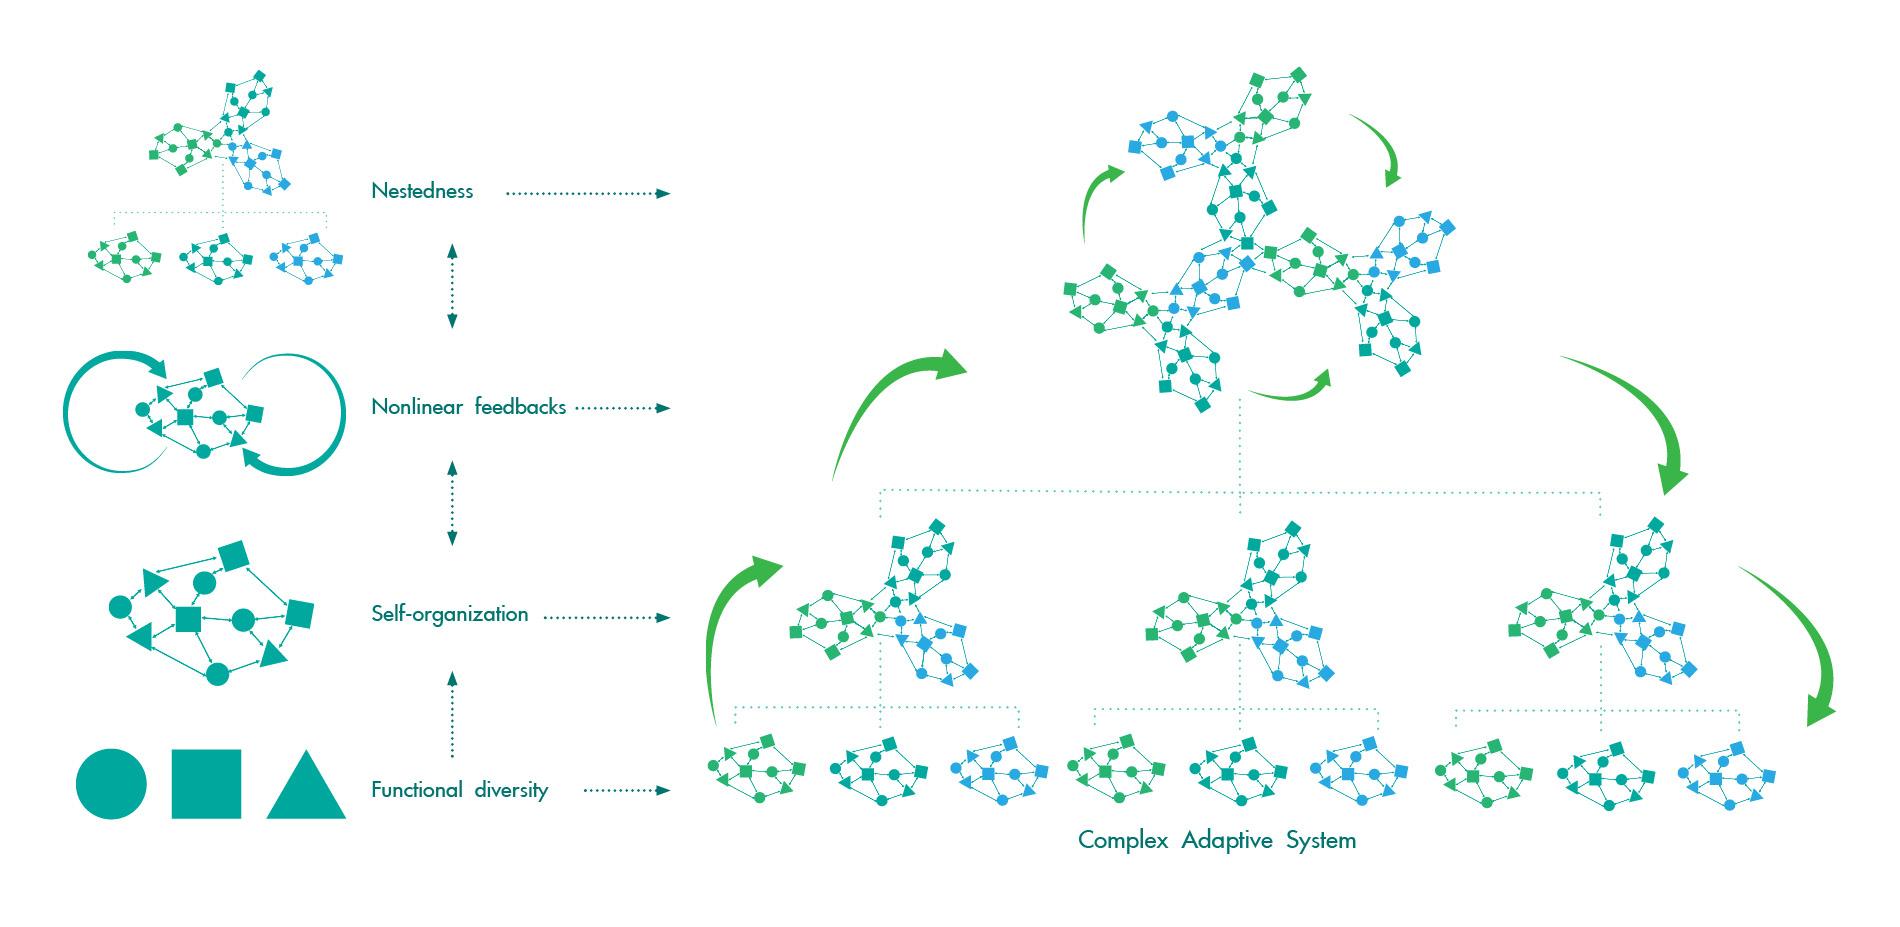 Key Characteristics of Complex Adaptive Systems